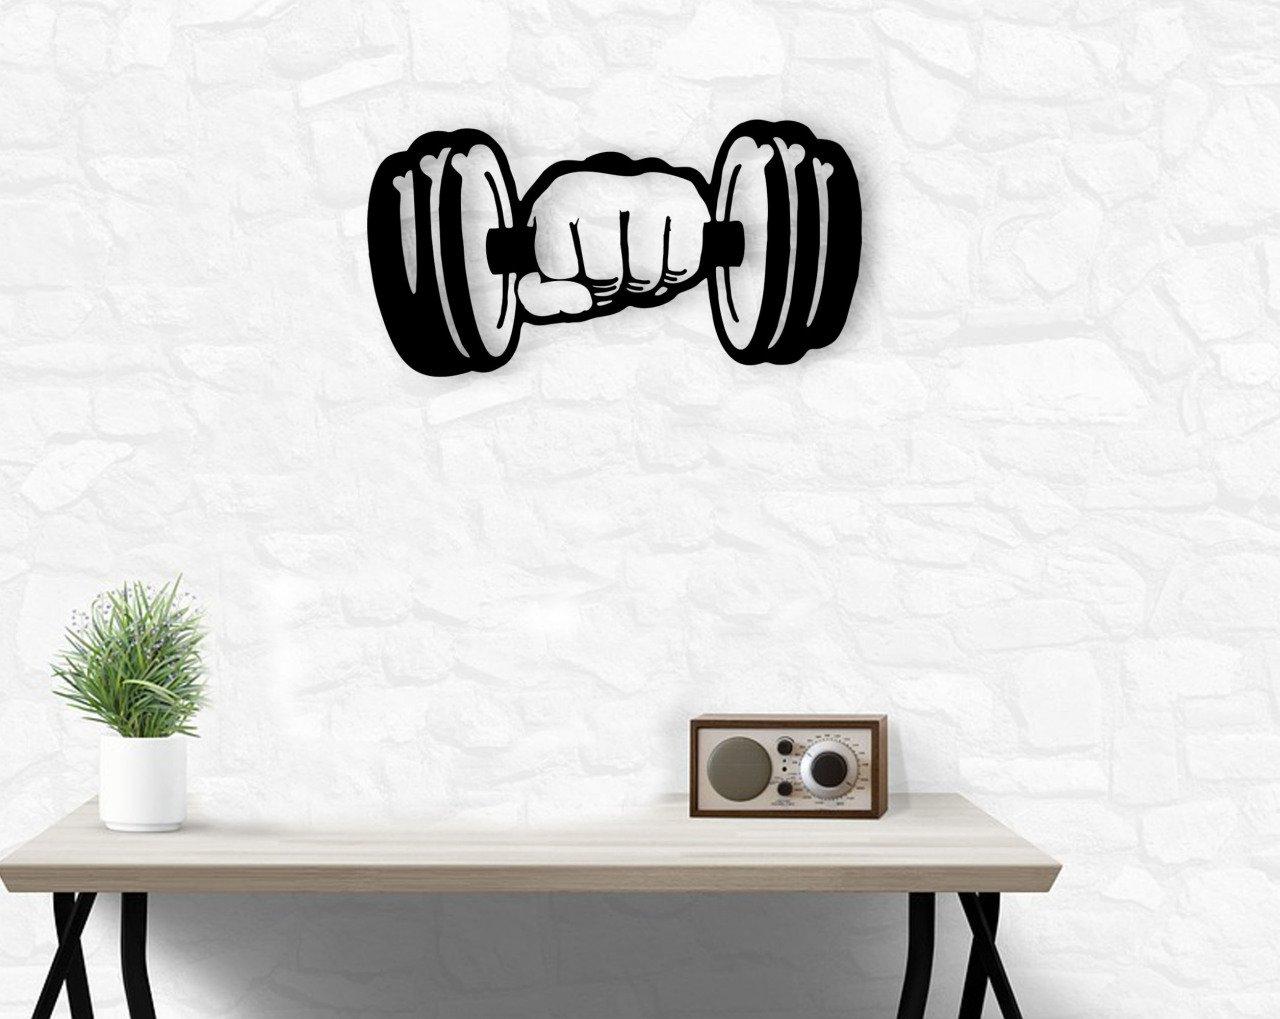 BK Home Dumble Wood Wall Decoration Modern Convenient Reliable Decoration Gift Quality Design Simple Cool Black Color